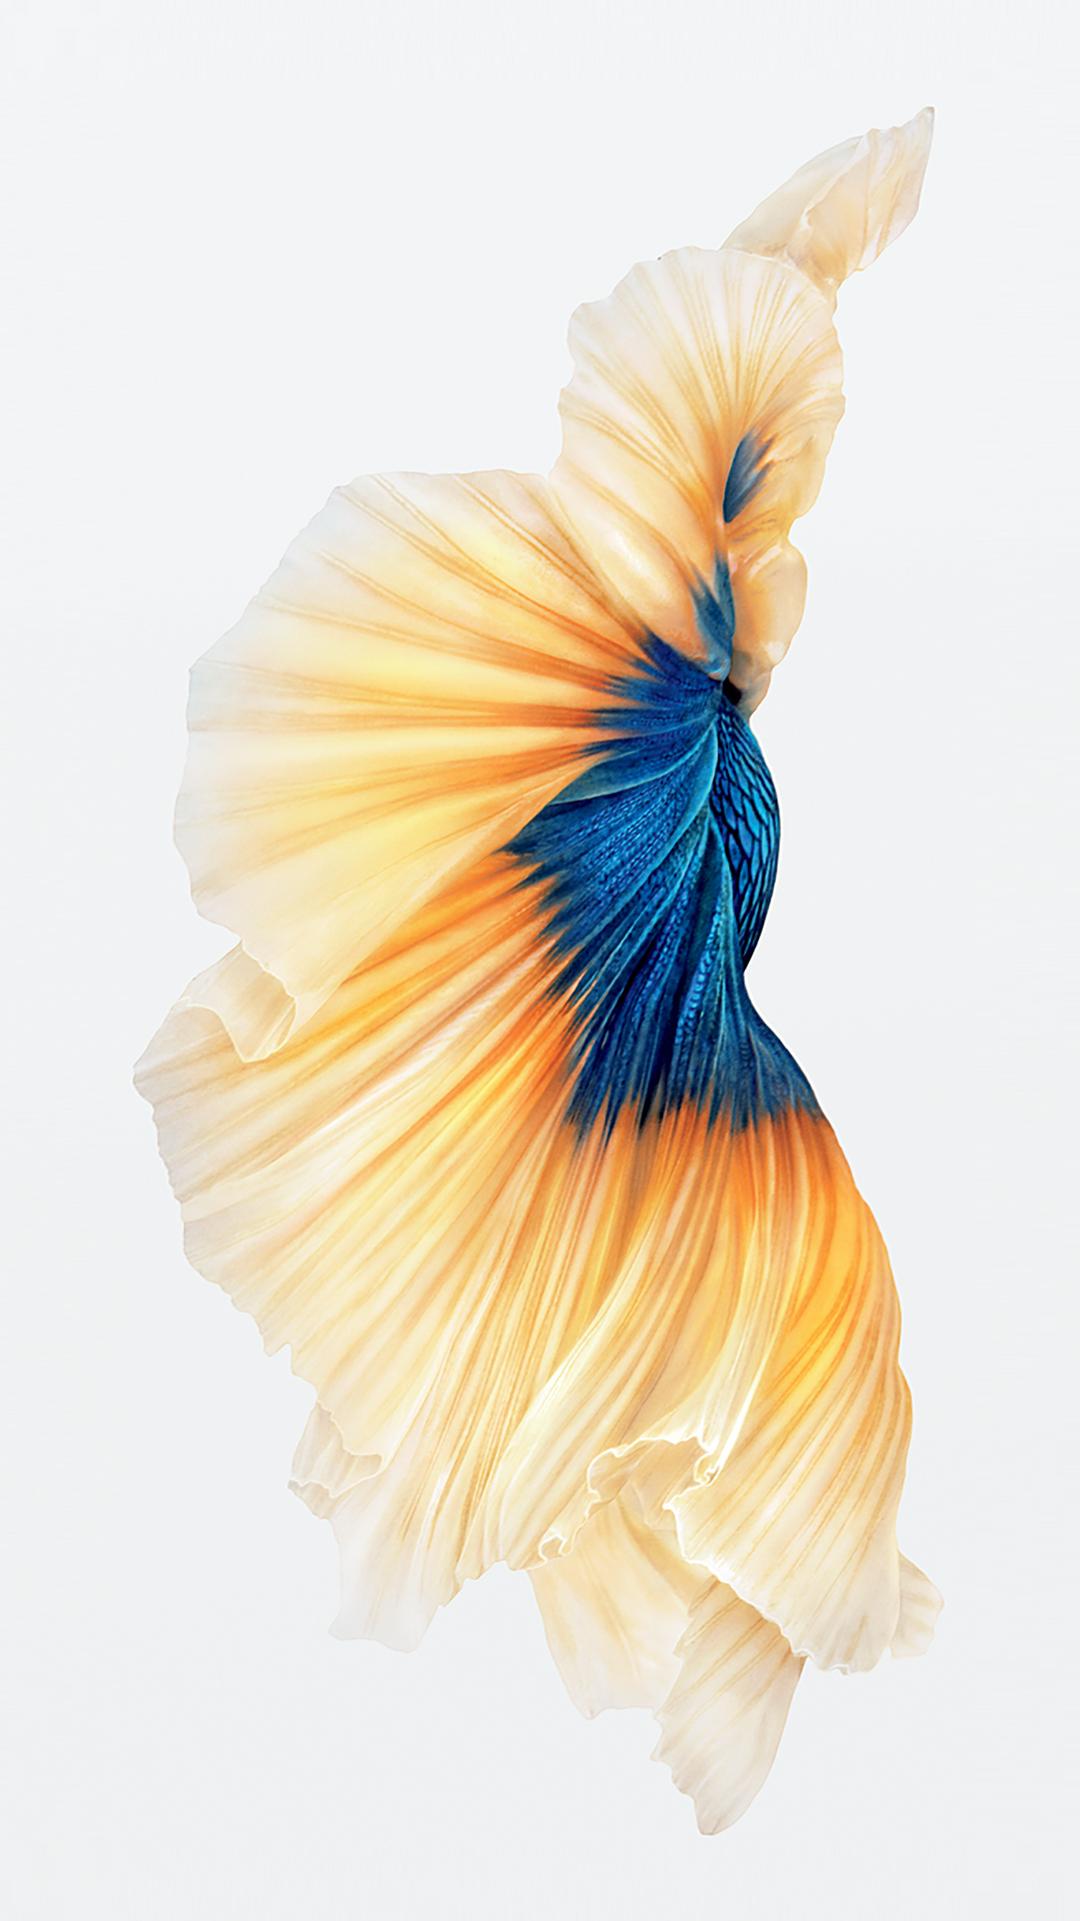 iPhone-6s-Fish-Gold-Wallpaper